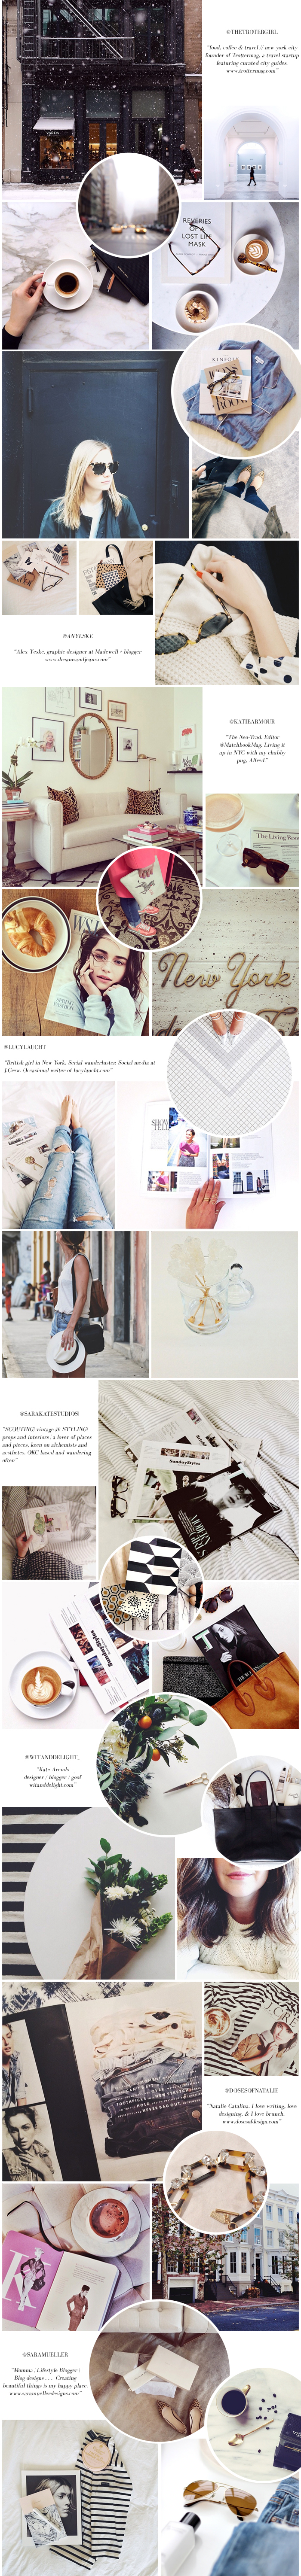 instagram-favorites-katiearmour-lucylaucht-witanddelight-sarakatestudios-thetrottergirl-anyeske-dosesofnatalie-saramueller